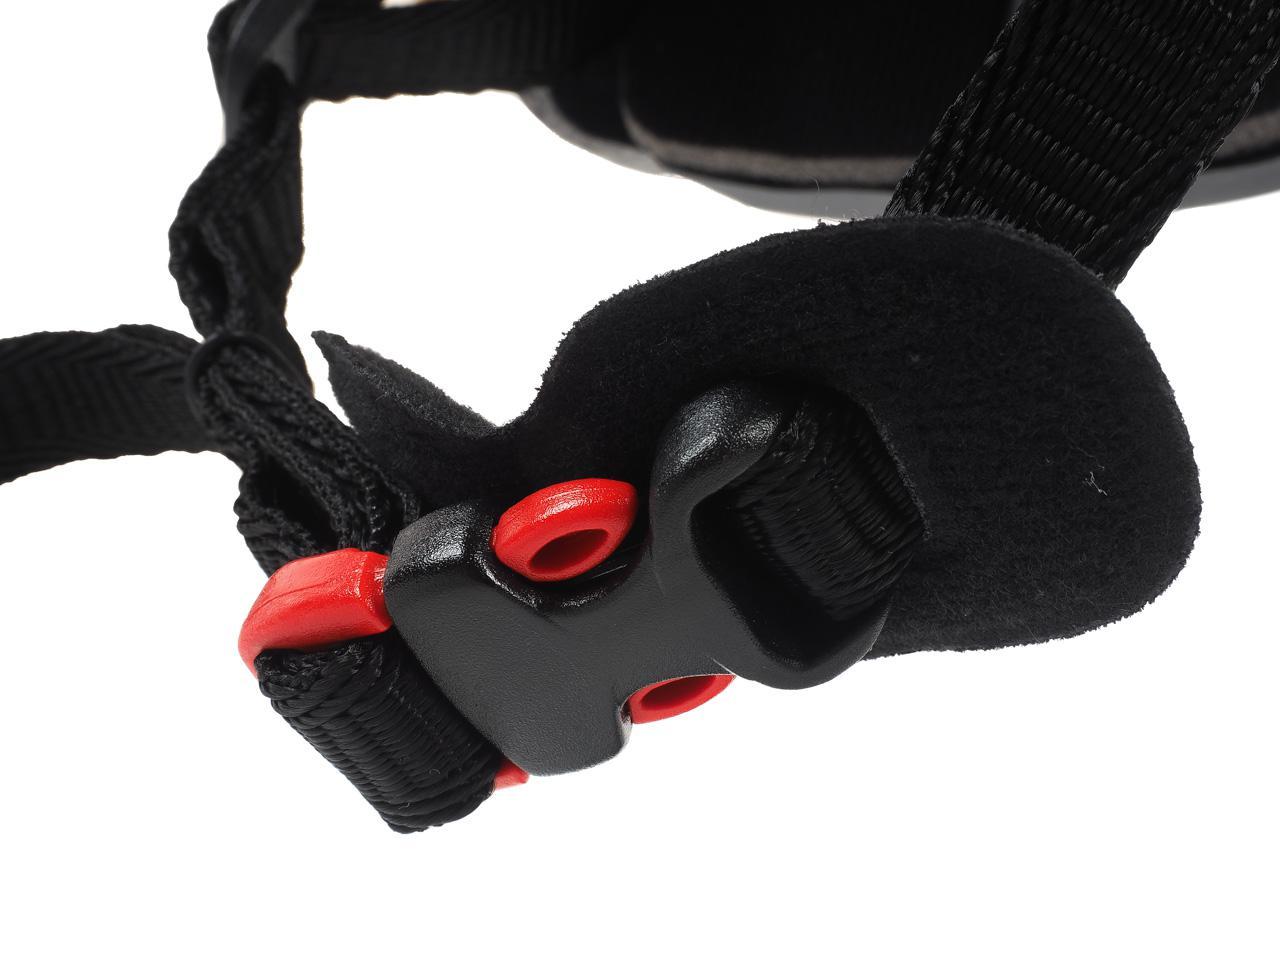 Casque-roller-skate-trotinette-Rollerblade-Twist-jr-blc-casque-Rose-15103-Neuf miniature 4